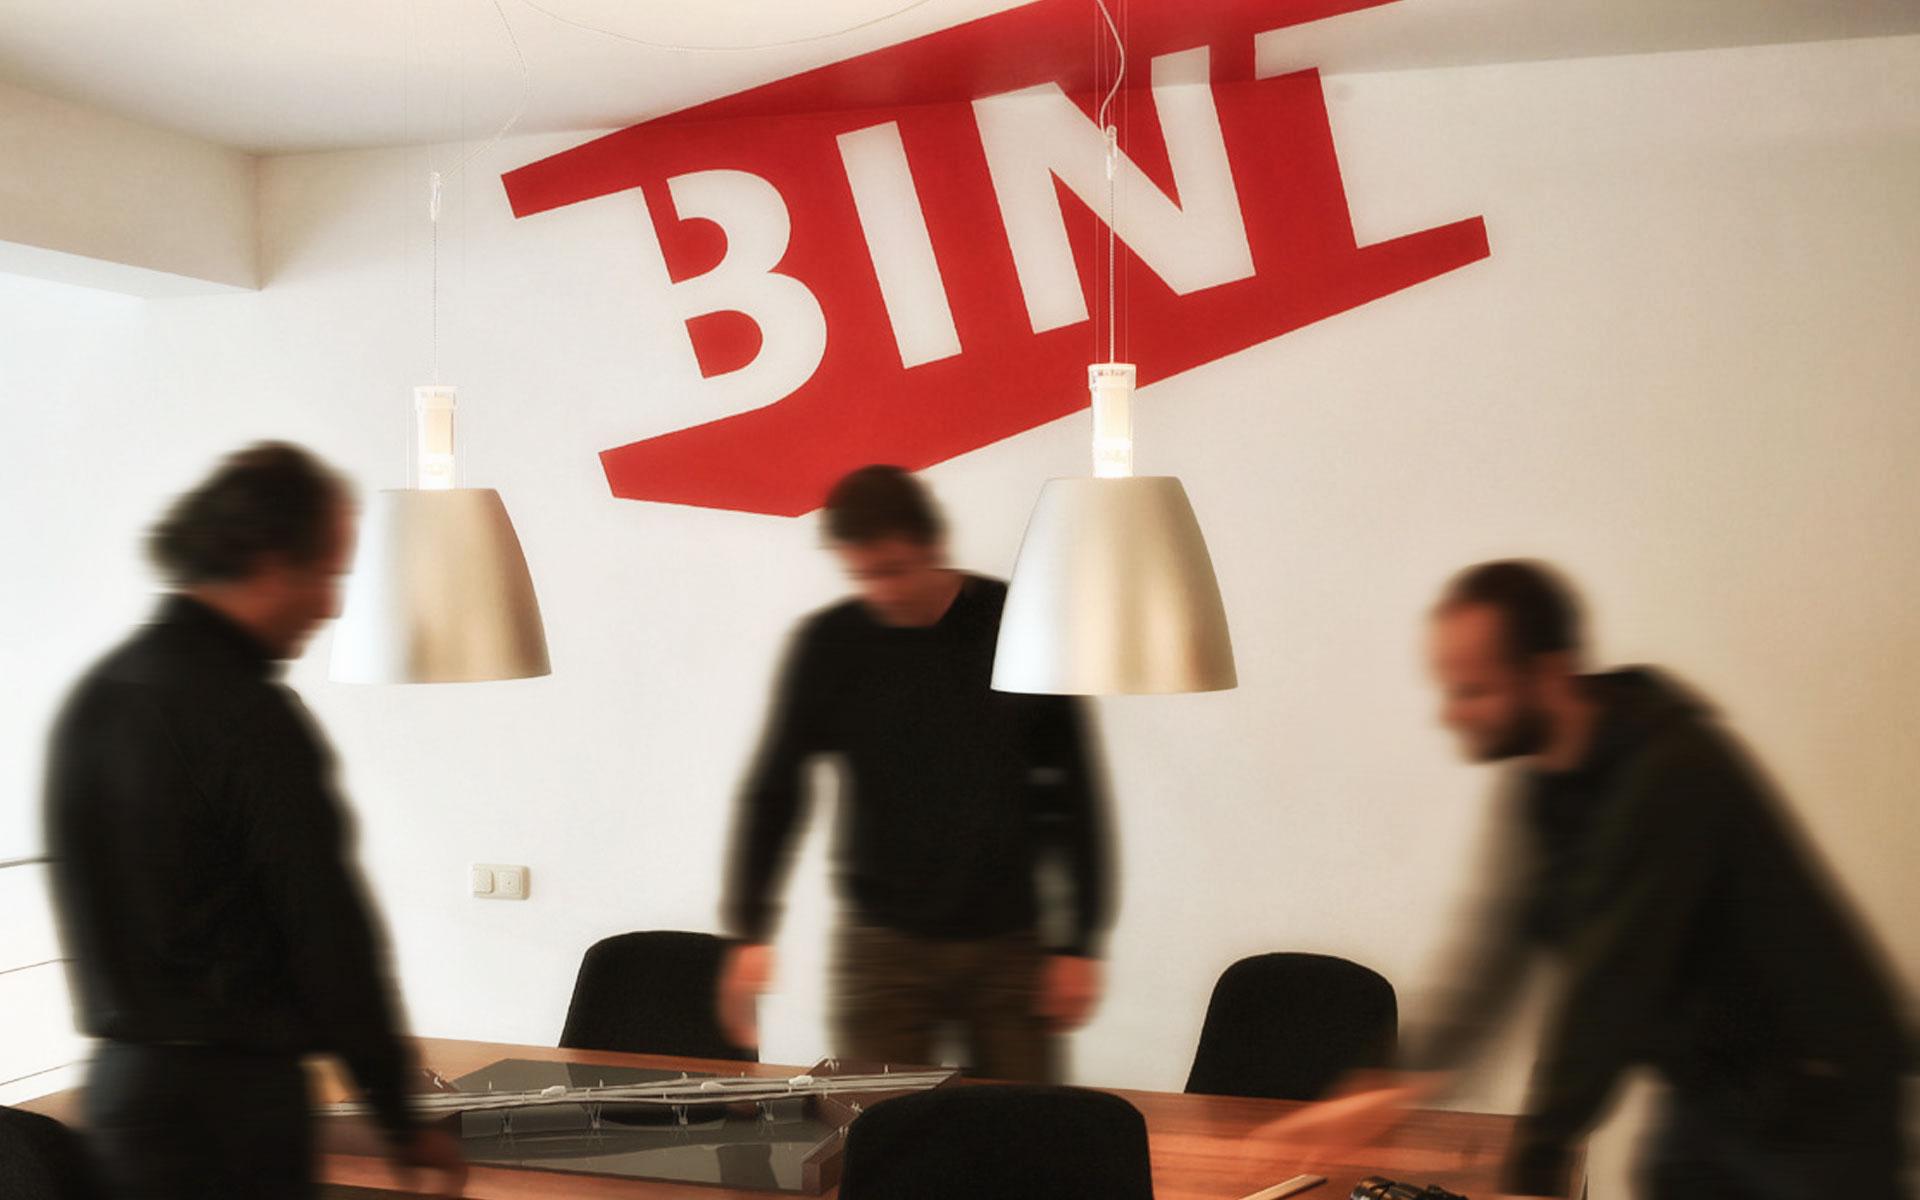 BINT architecten